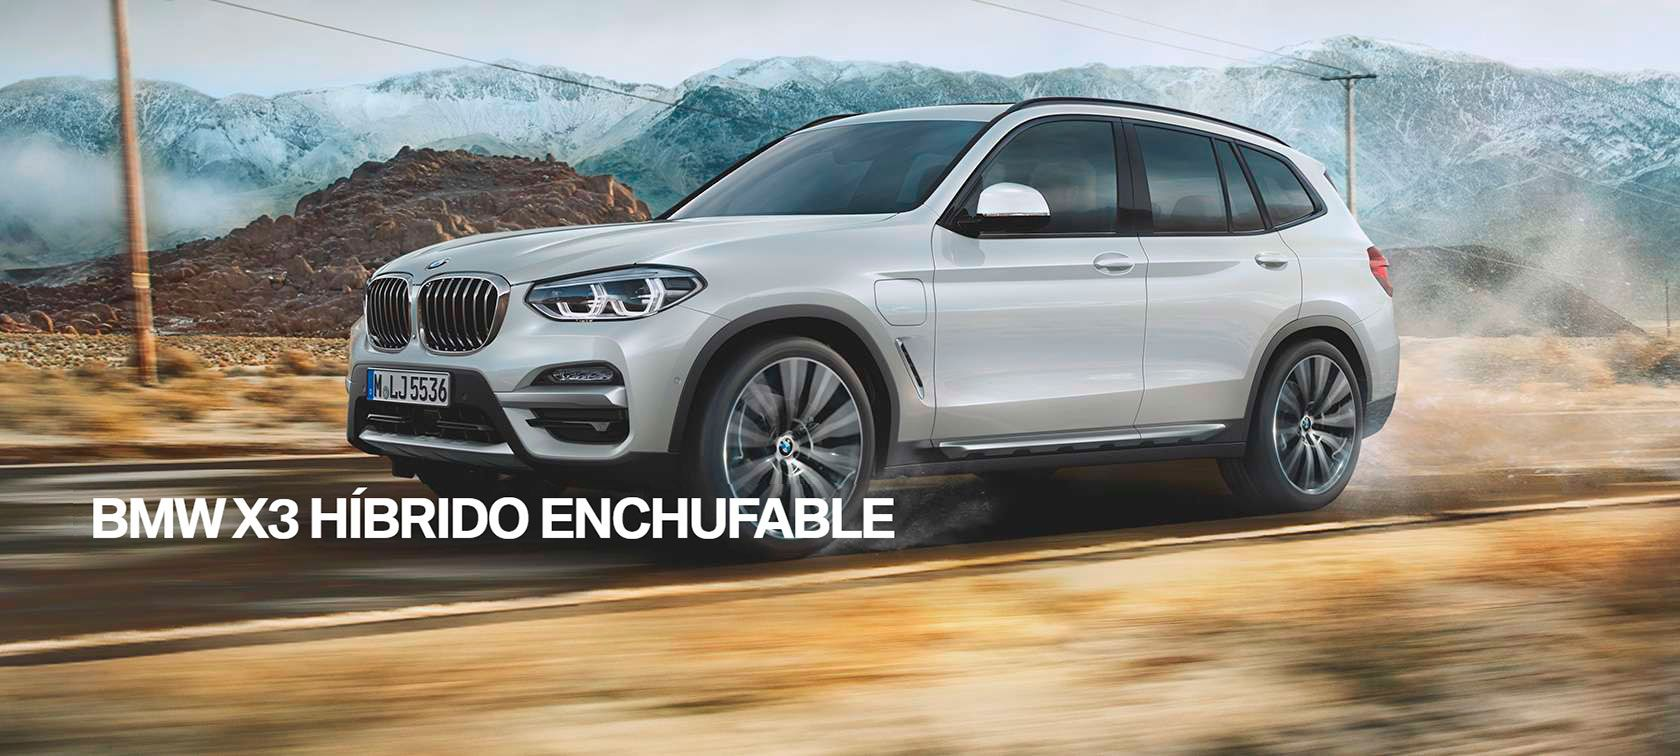 BMW X3 HÍBRIDO ENCHUFAFLE